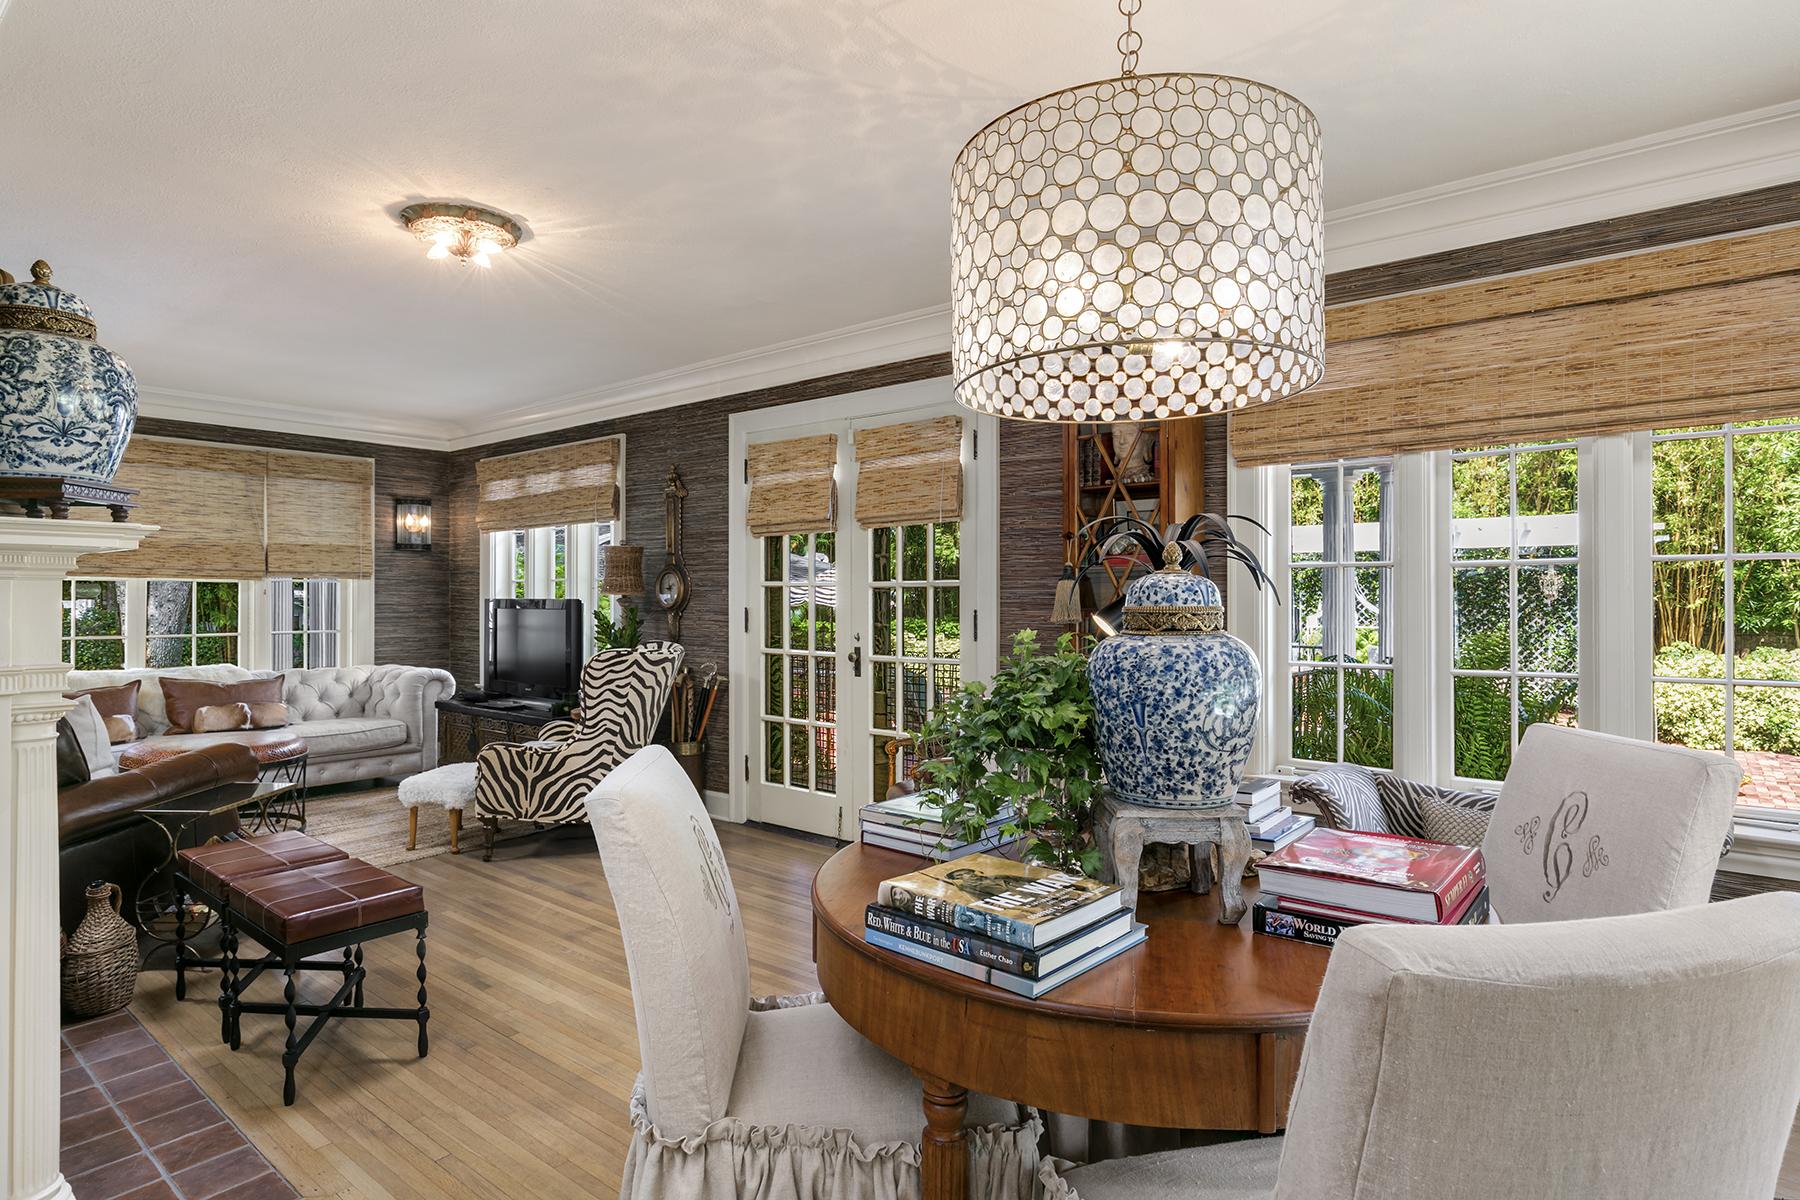 Additional photo for property listing at ORLANDO 1101 W Princeton St,  Orlando, Florida 32804 United States